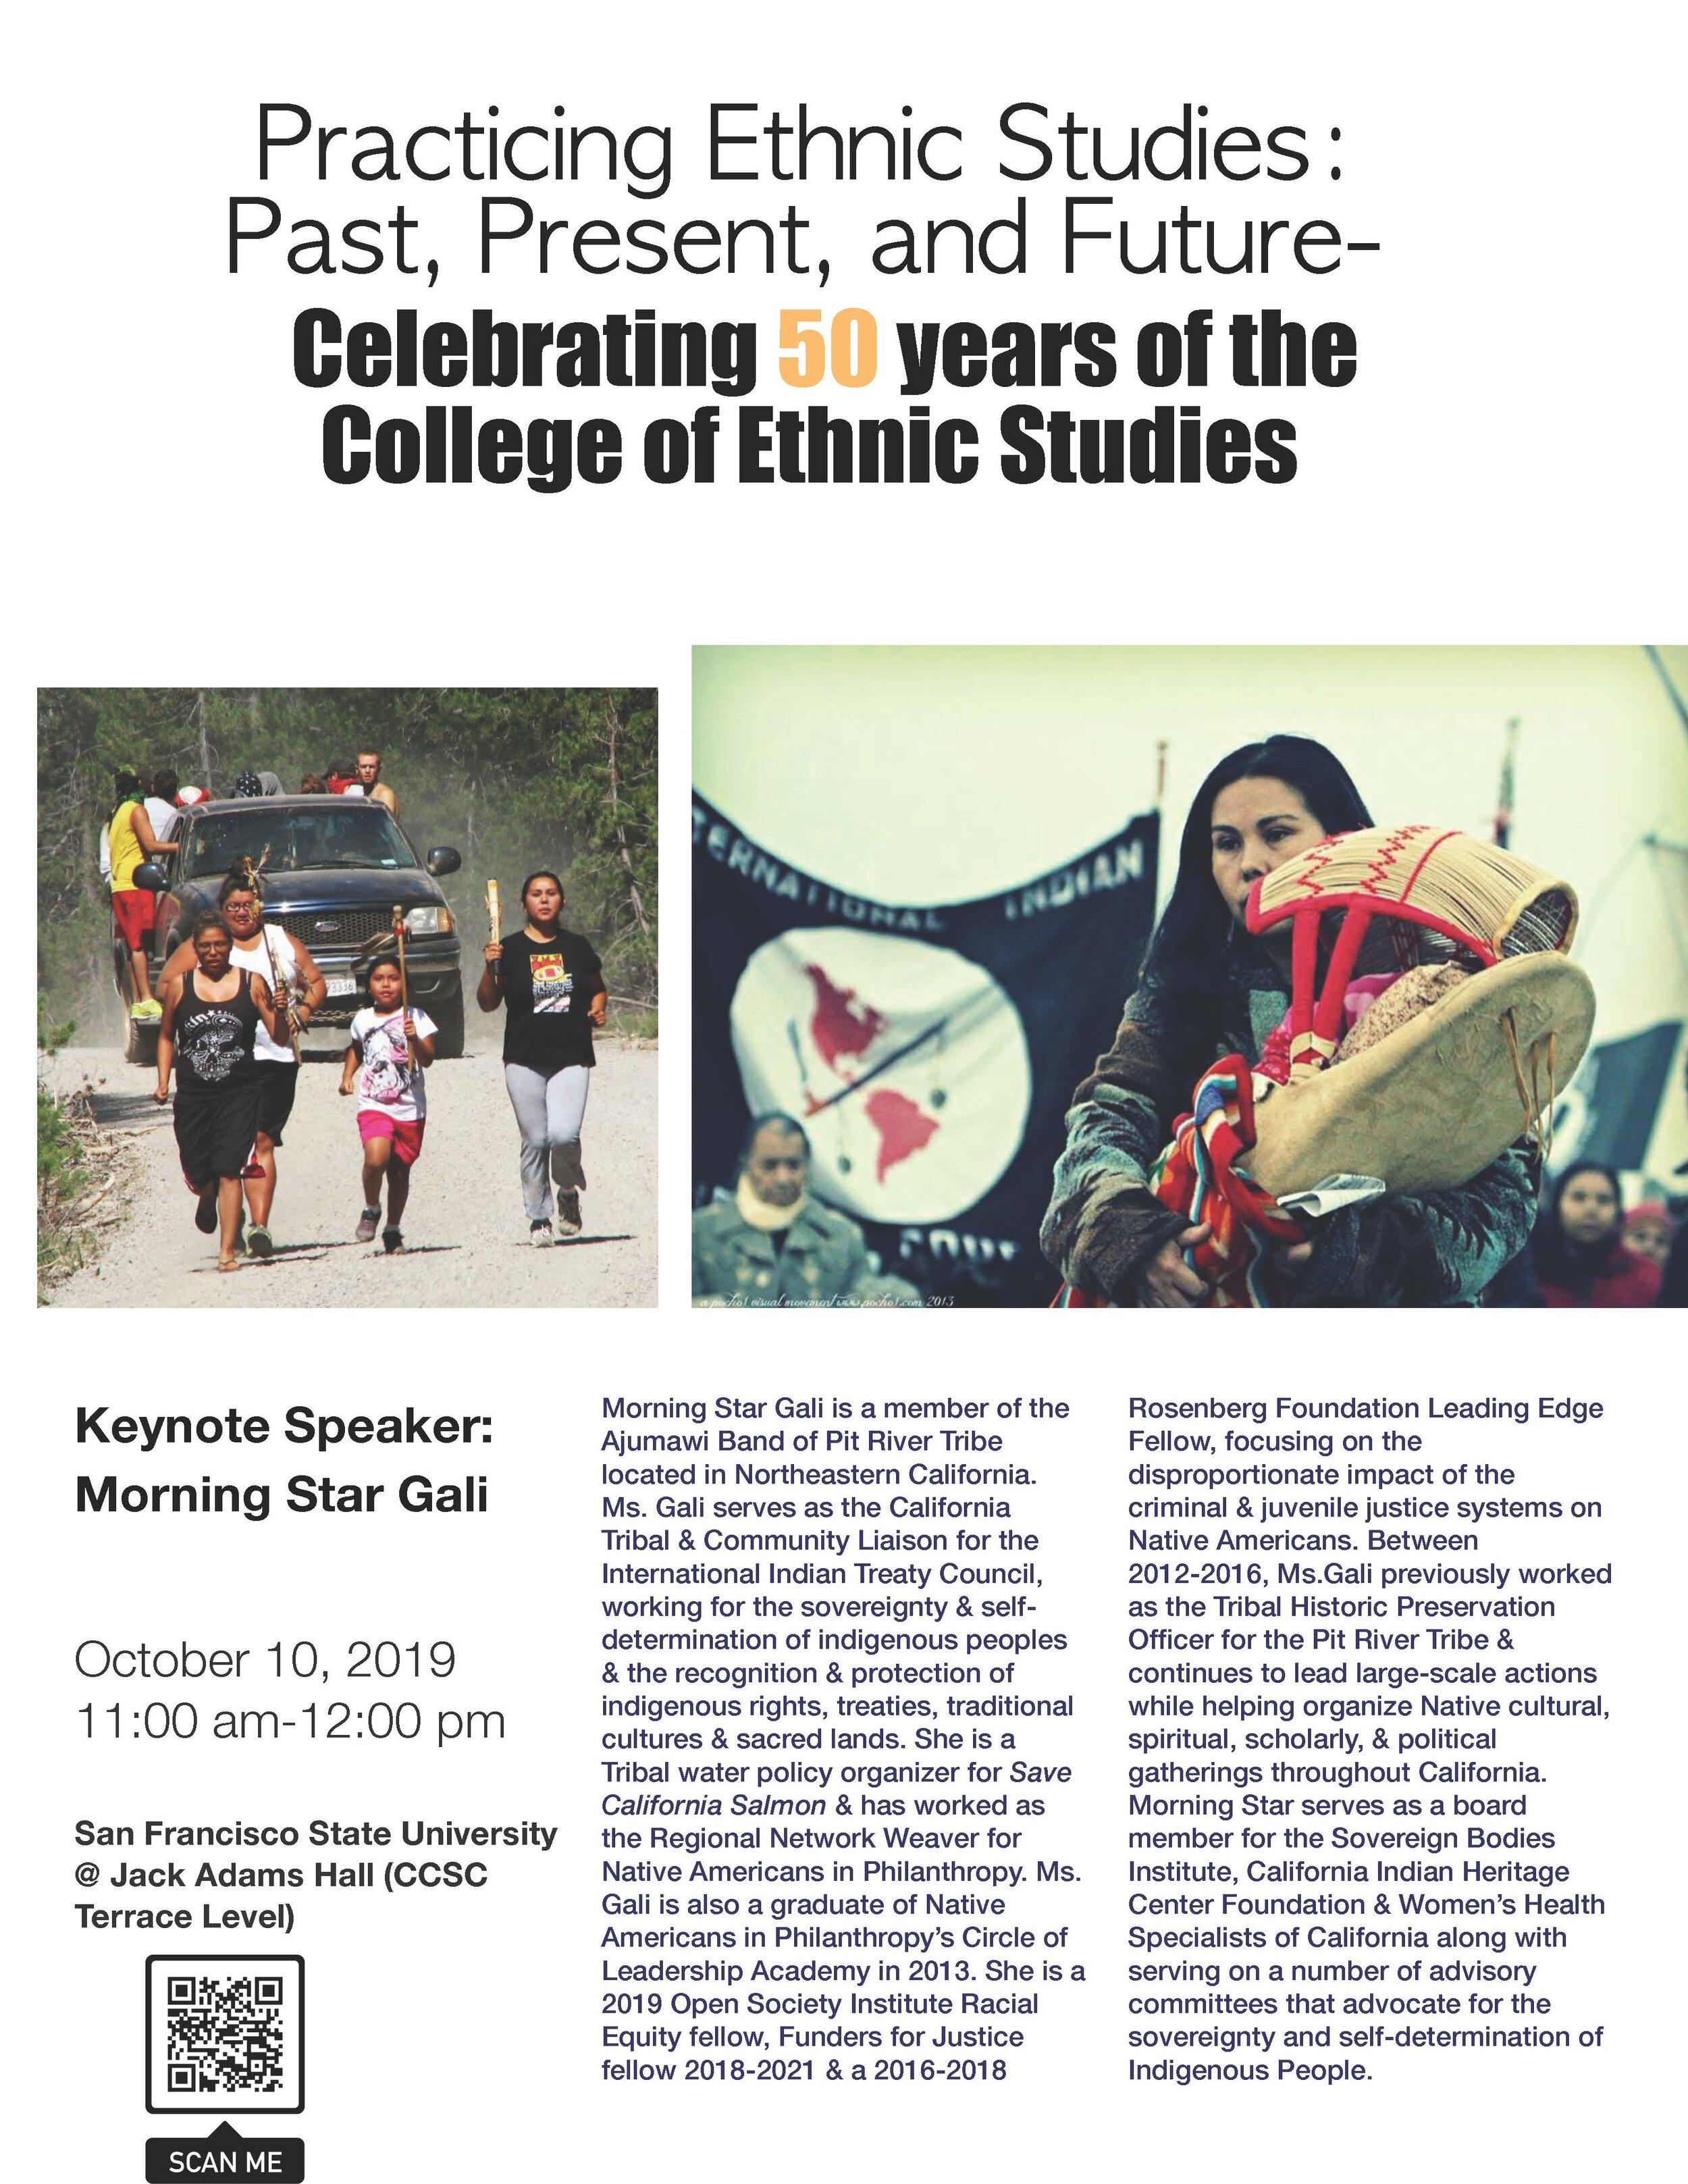 morning star gali keynote address.jpg